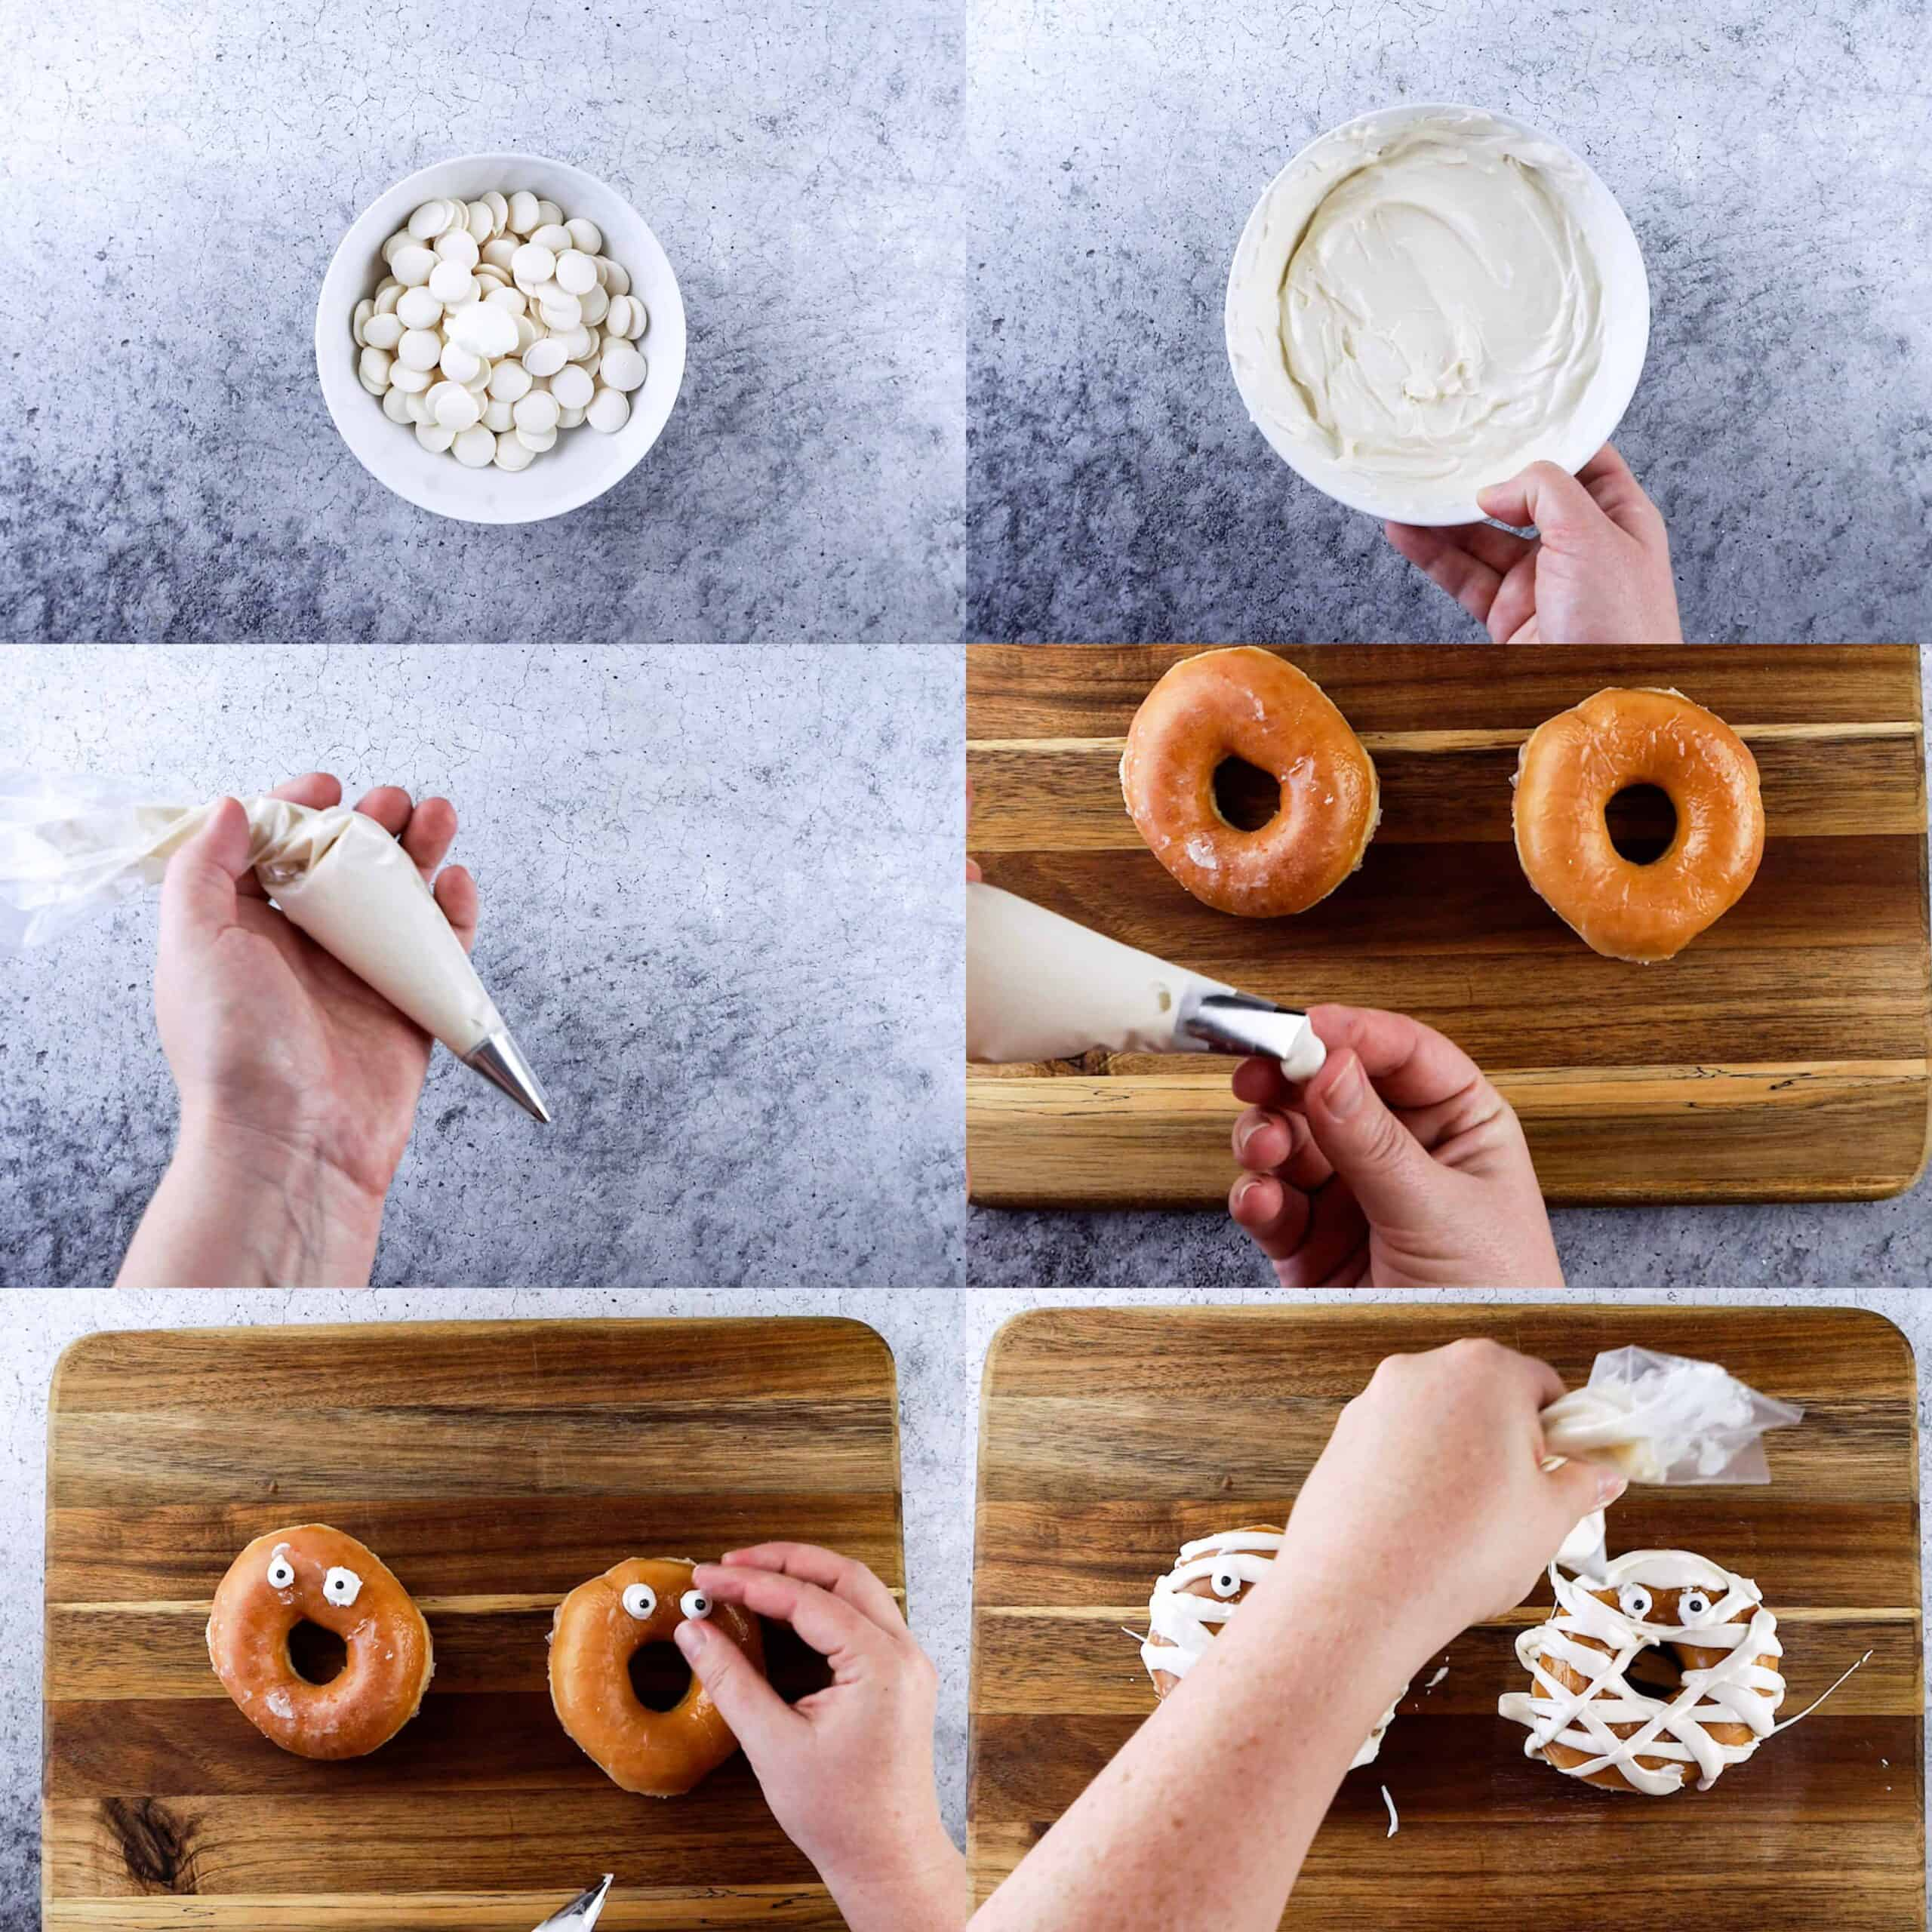 process shots for making mummy donuts